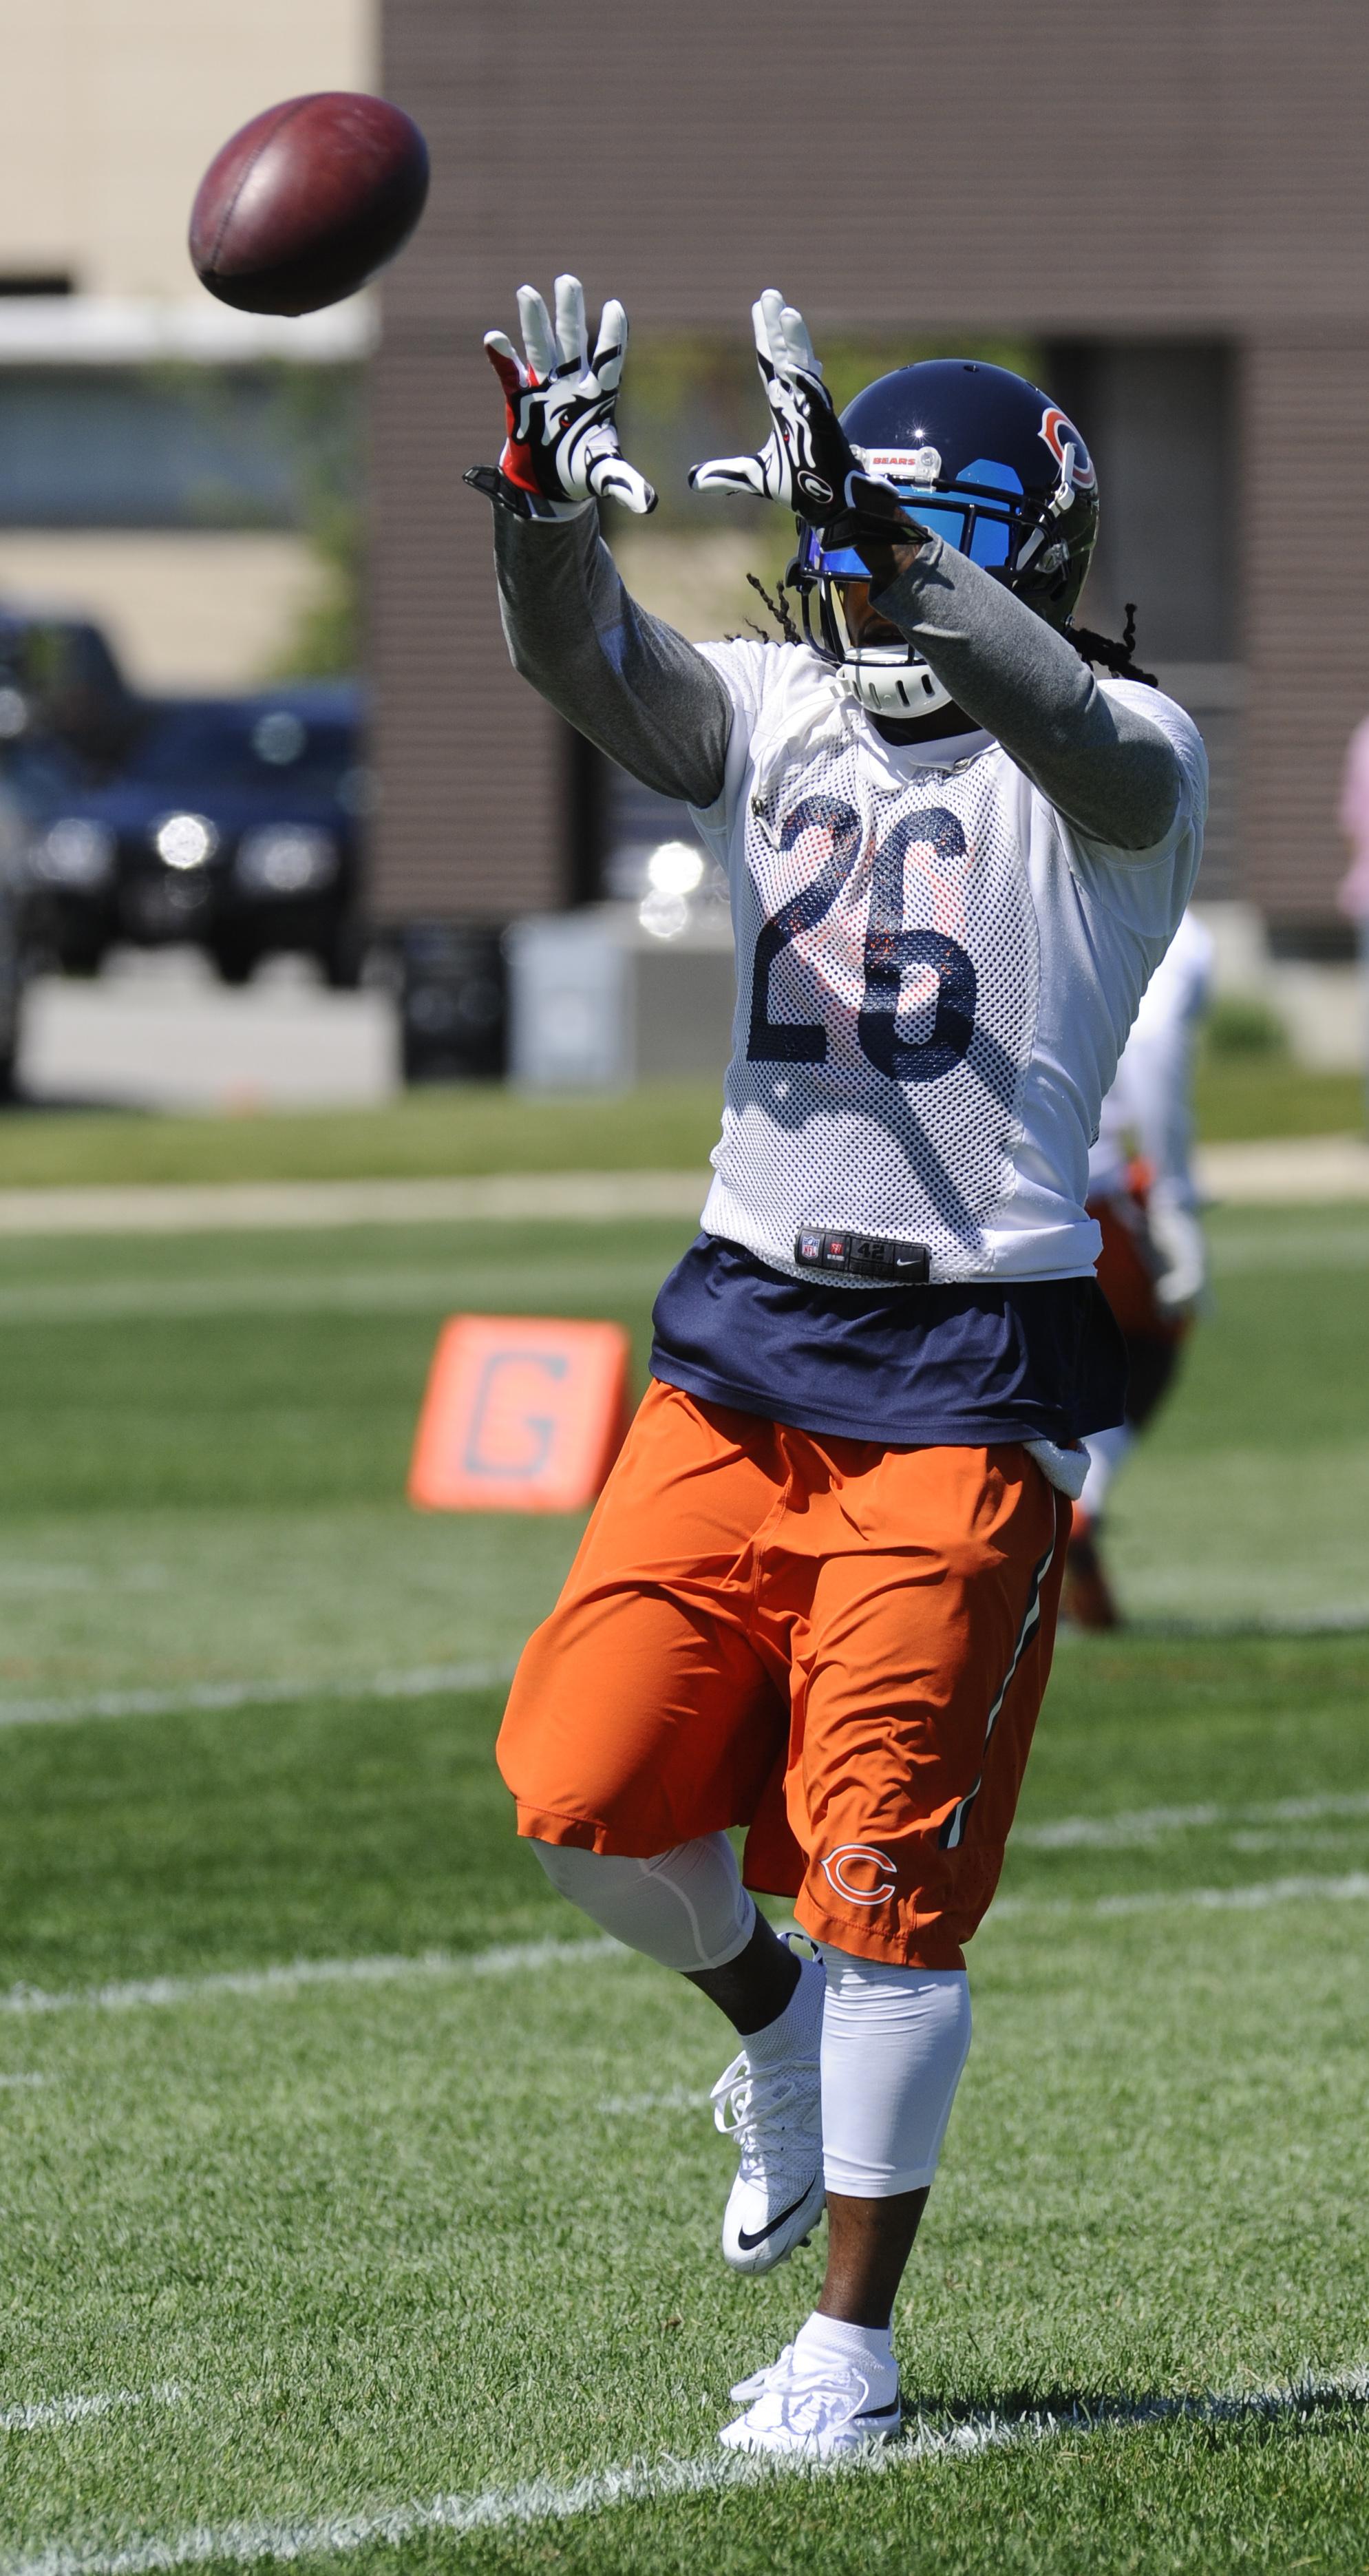 Chicago Bears cornerback Tim Jennings  at NFL football minicamp at Halas Hall on Tuesday, June 16, 2015, in Lake Forest, Ill. (AP Photo/Matt Marton)